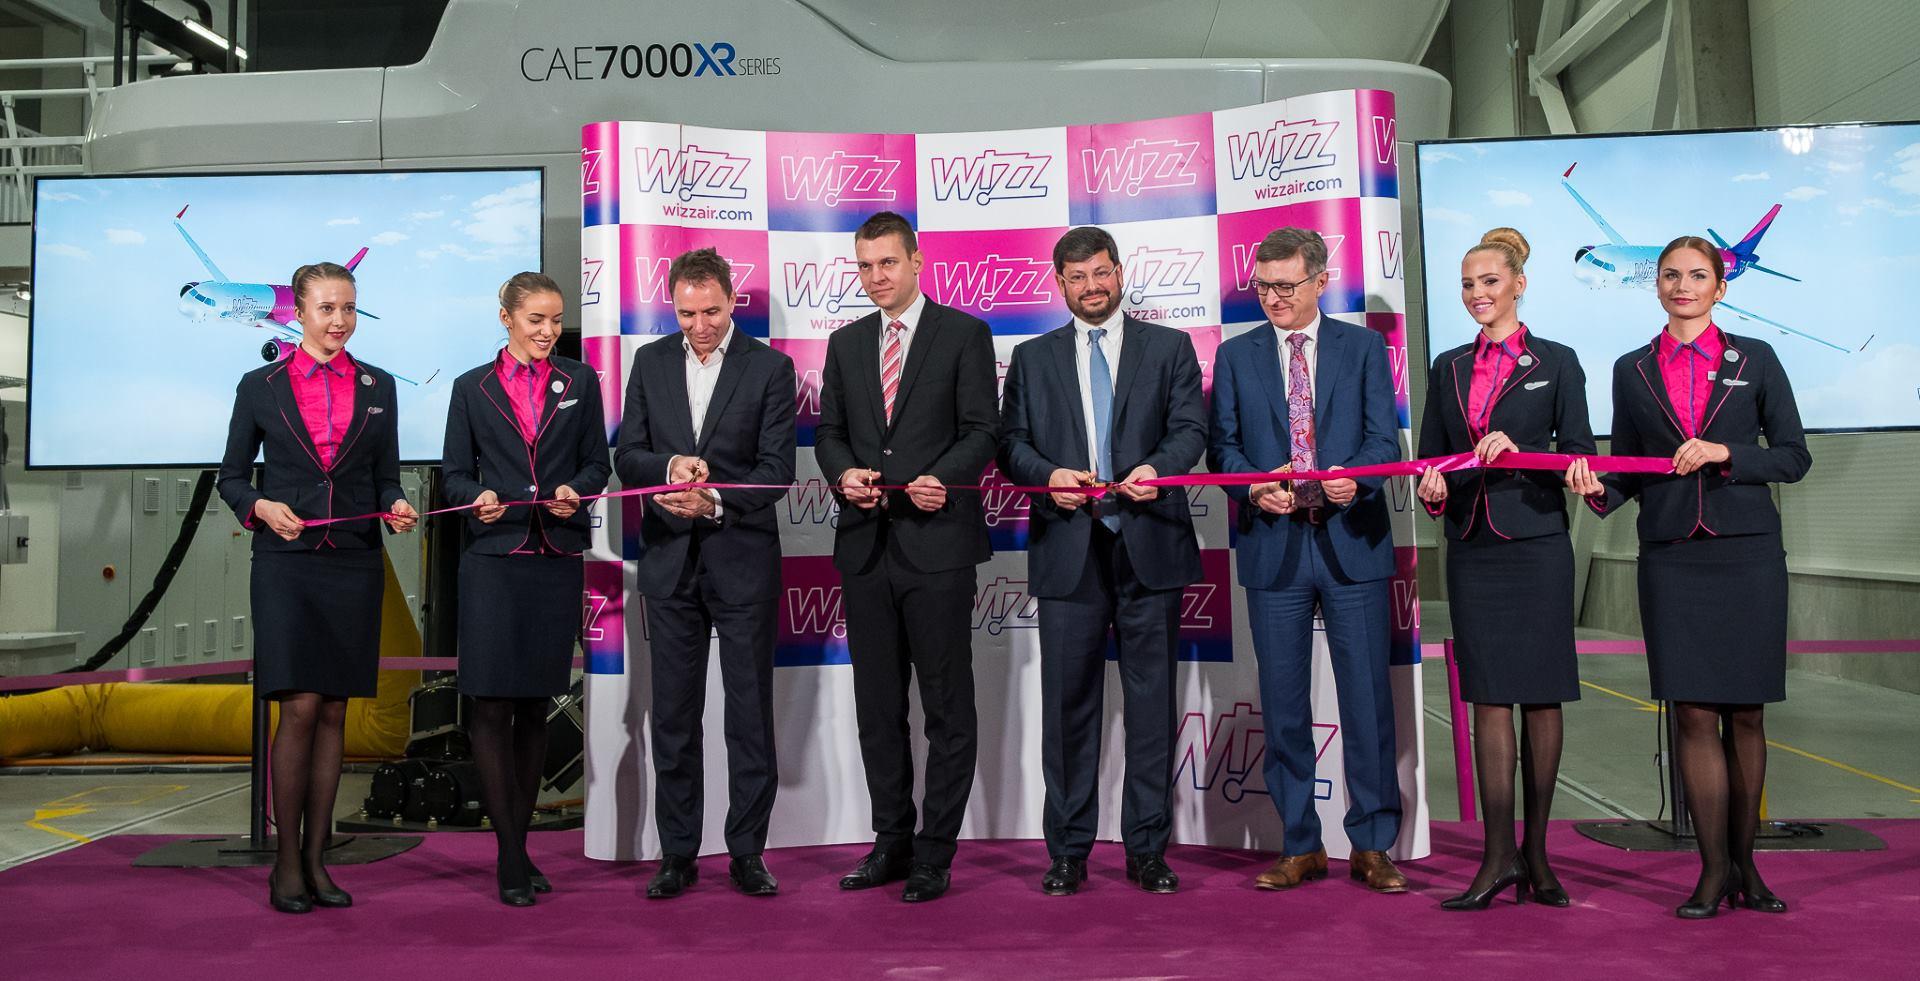 FOTO: Wizz Air otvorio suvremeni Trening centar u Budimpešti